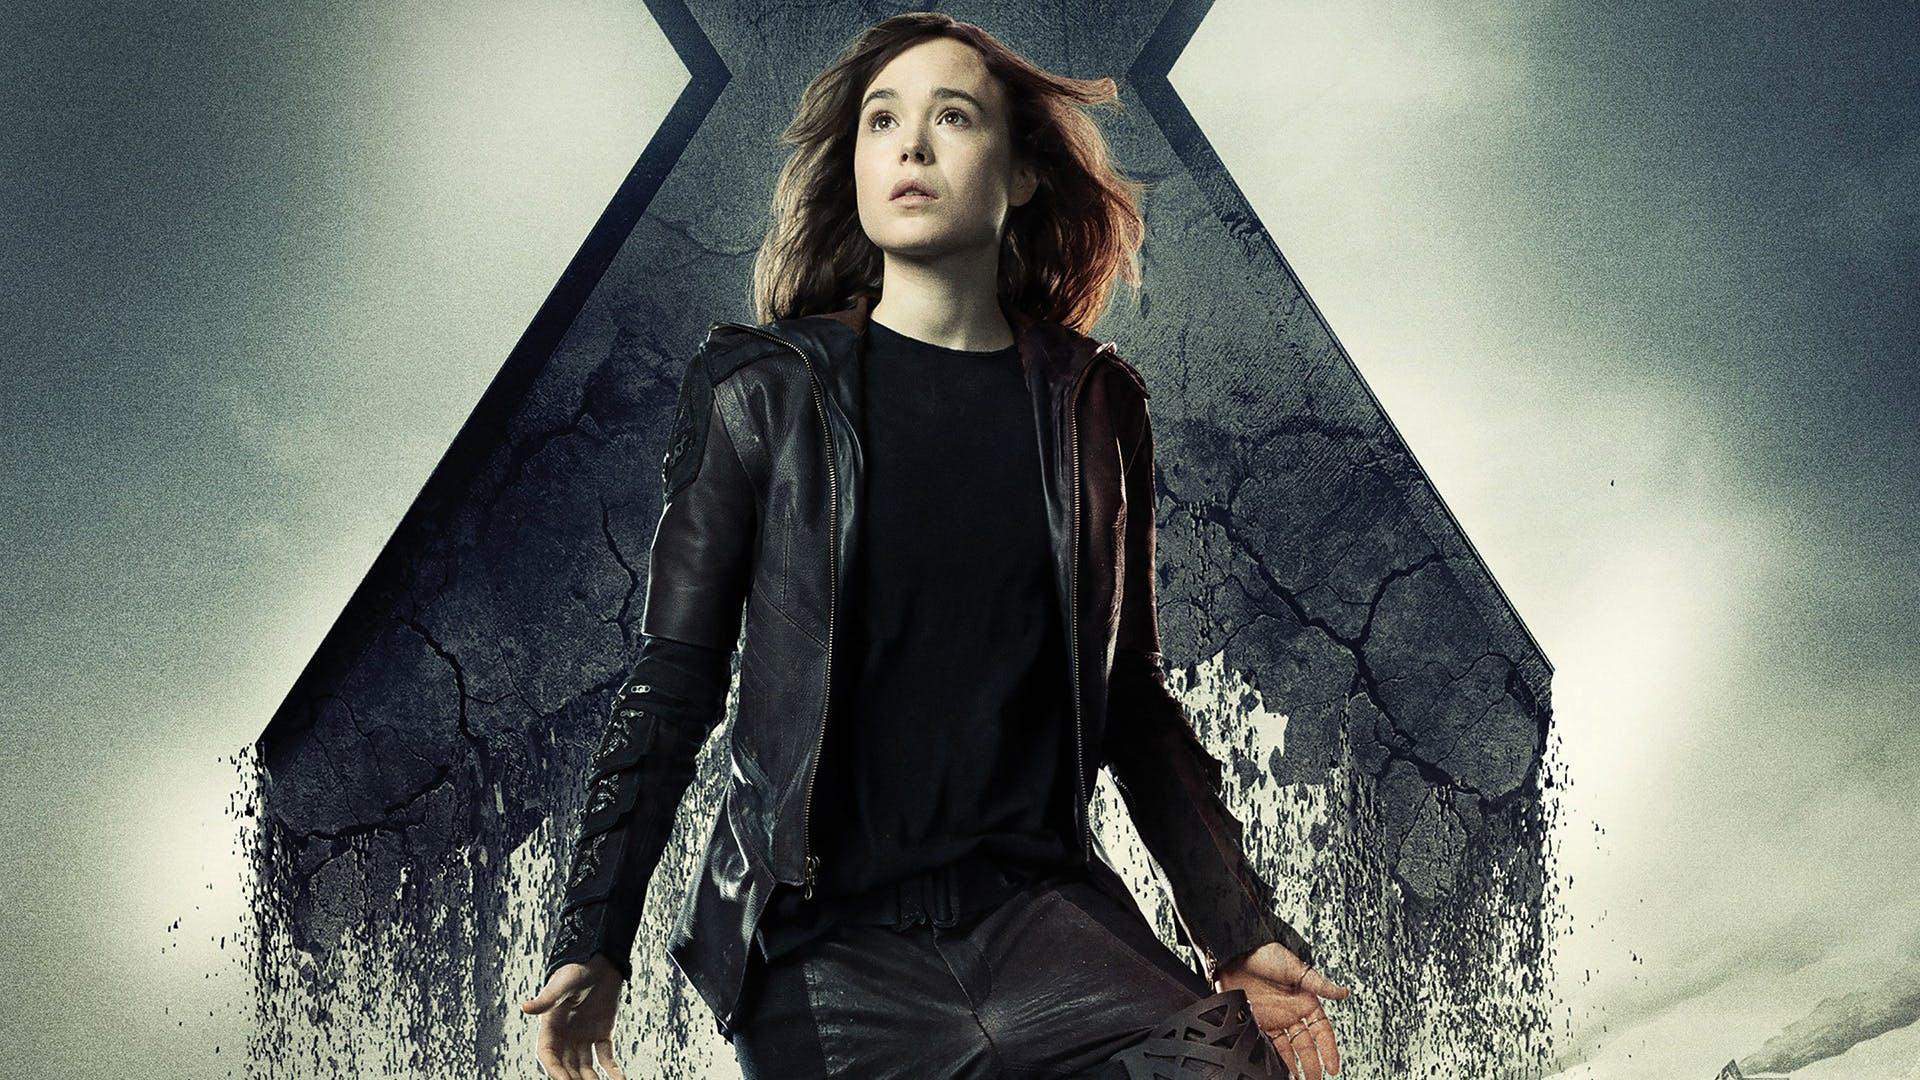 Kitty-Pryde-X-Men-Days-Of-Future-Past-Ellen-Page